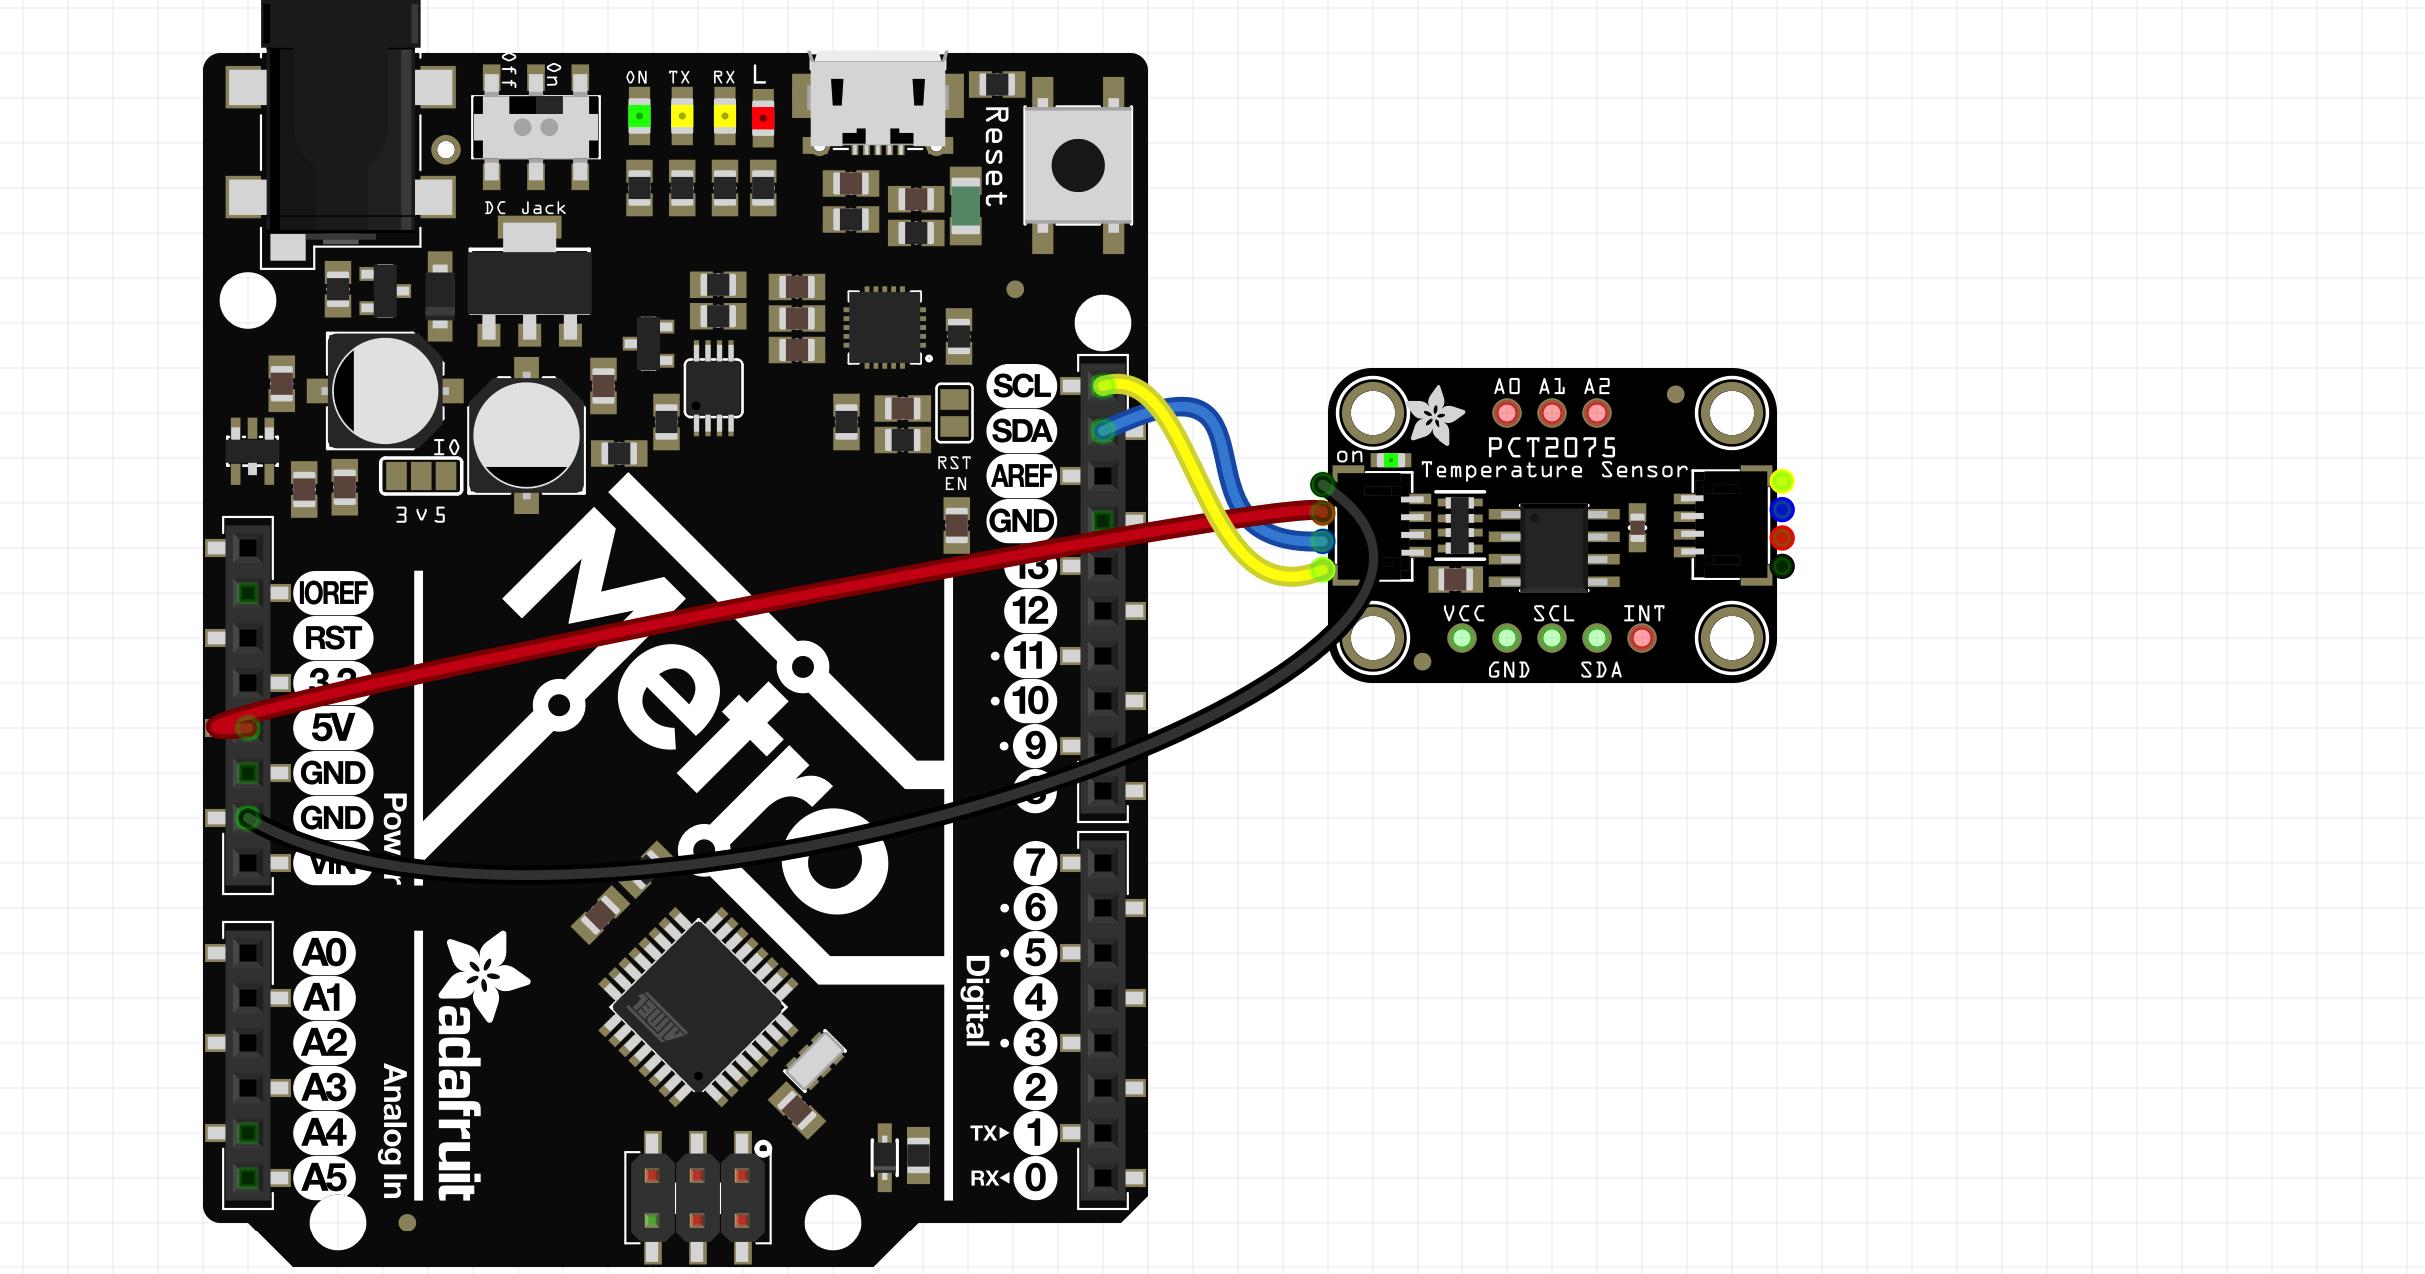 adafruit_products_arduino_stemmaqt_wiring.png